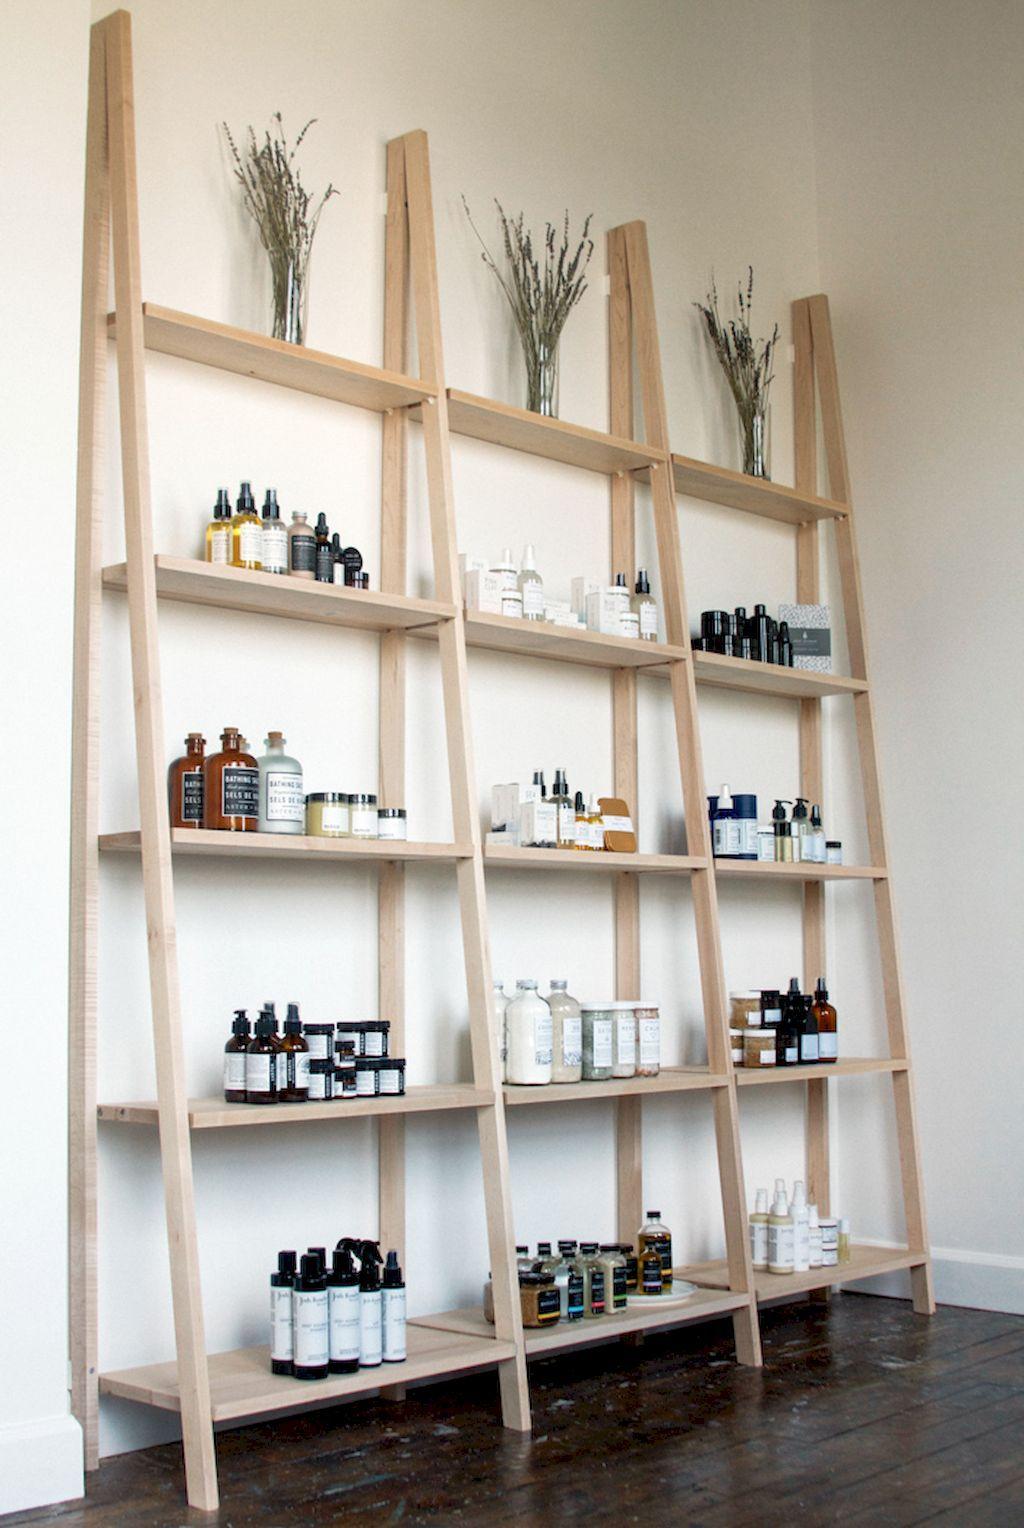 50 Creative Diy Shelves Ideas For Around Your Home Storage